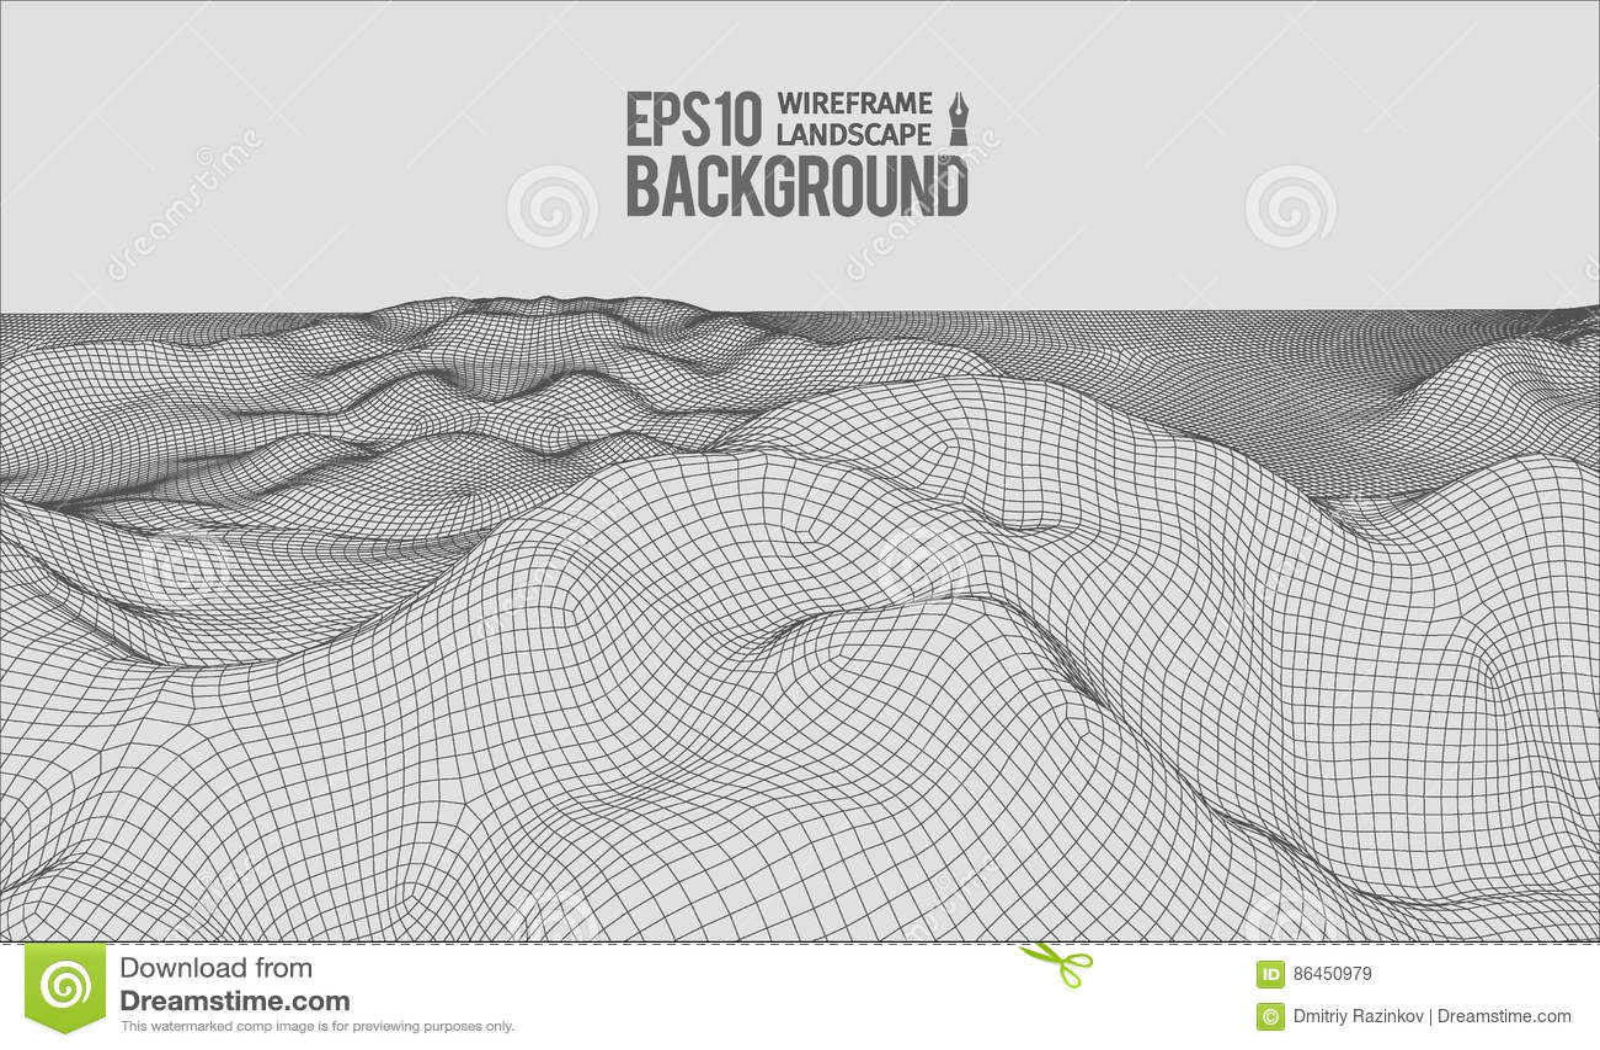 Vecteur EPS10 grand-angulaire de terrain de 3D Wireframe